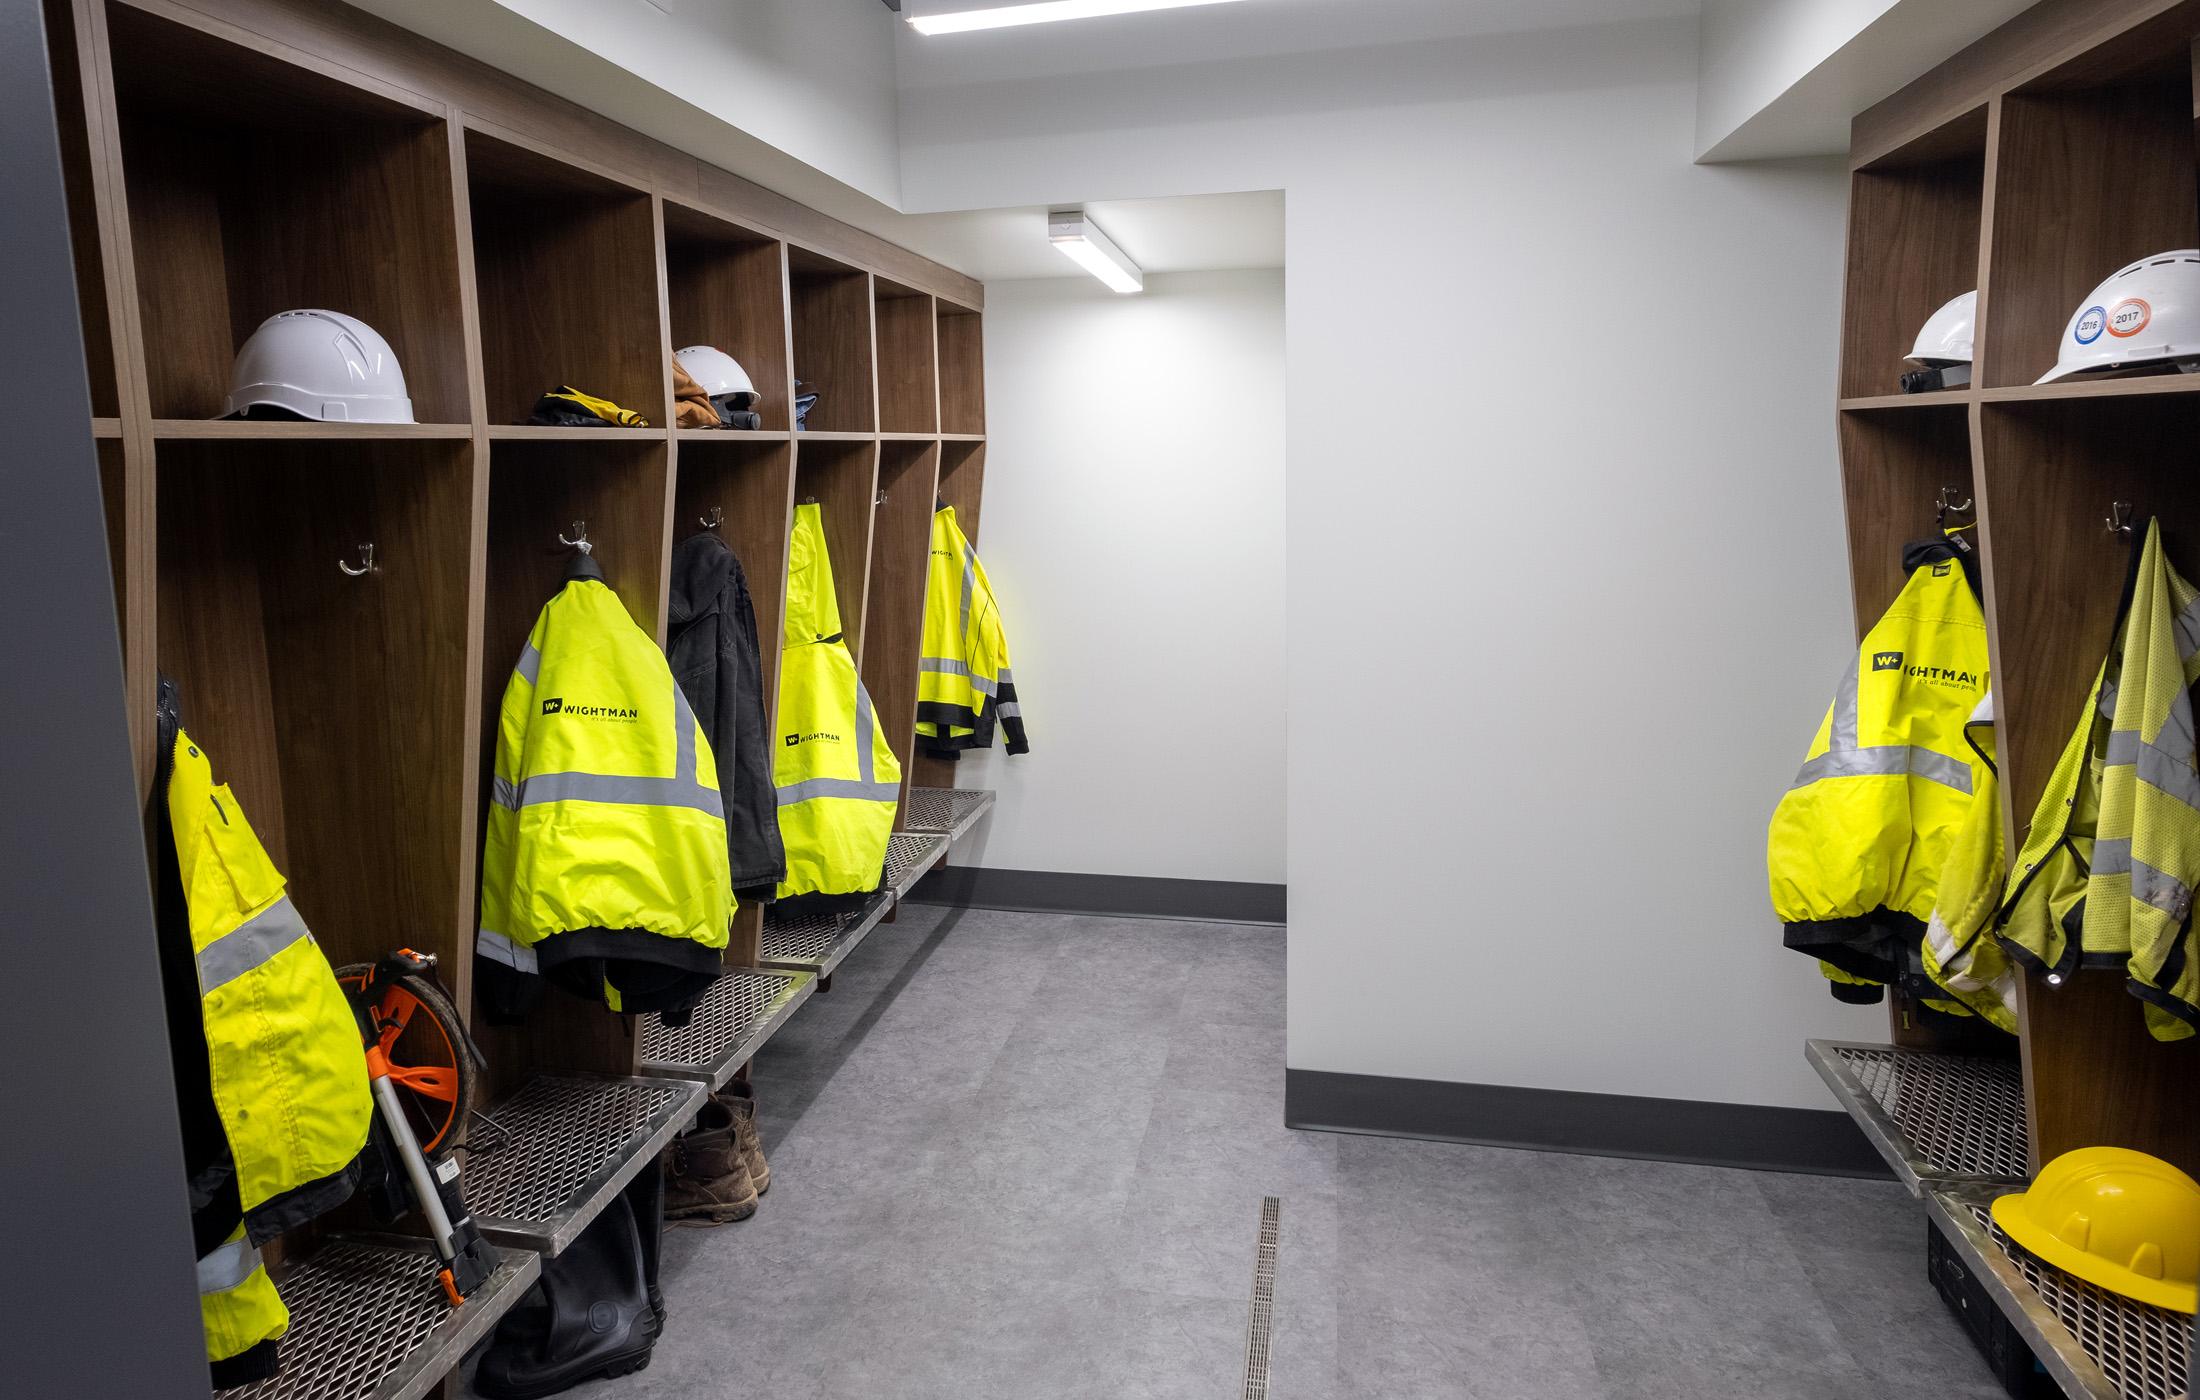 Wightman Kalamazoo survey crew room